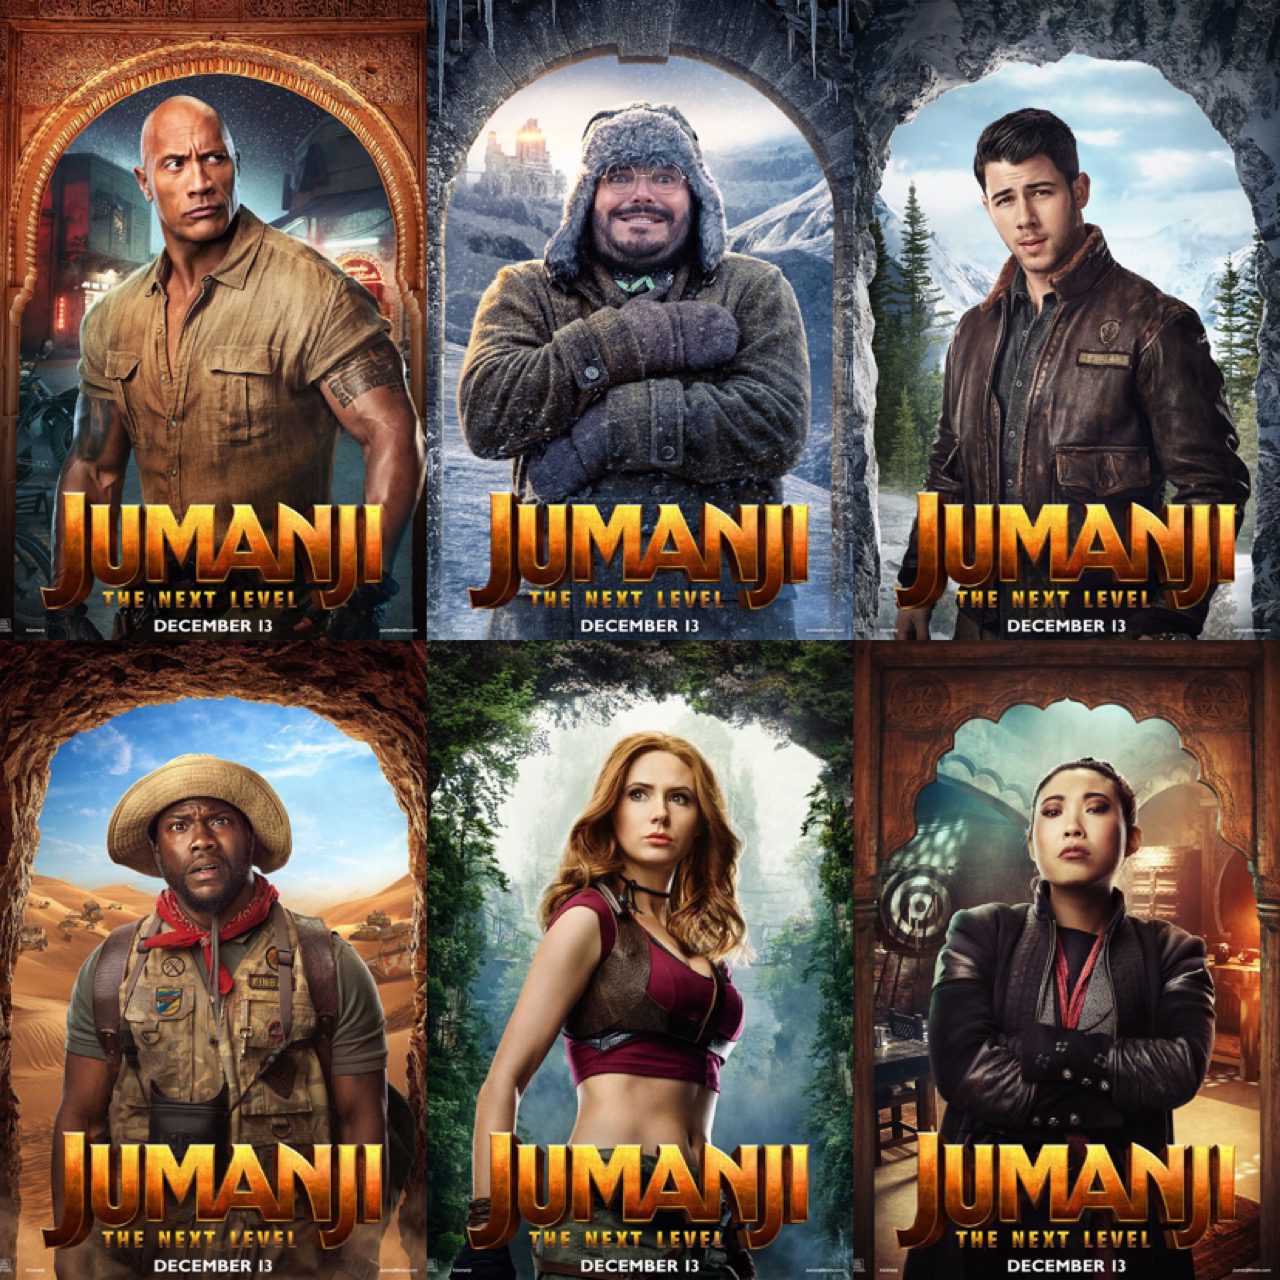 Jumanji The Next Level character posters Jumanji movie